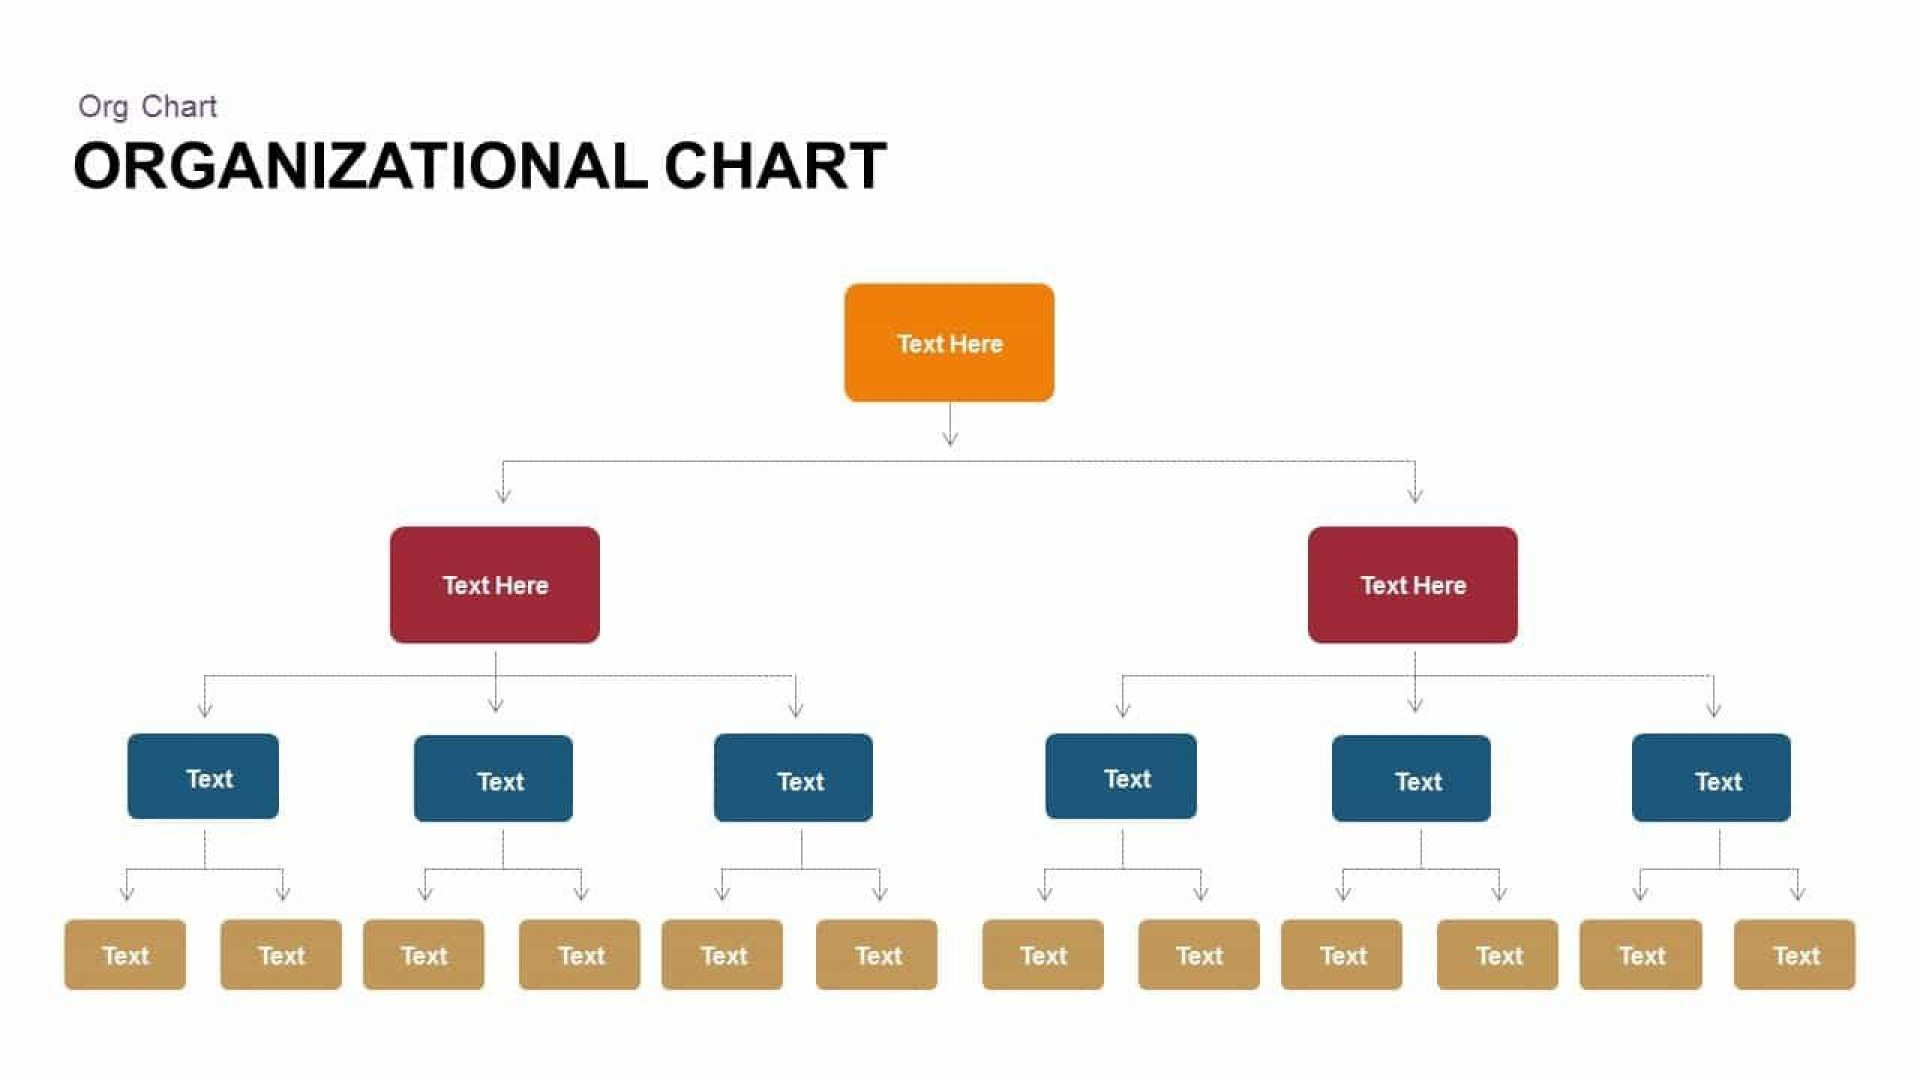 008 Top Organizational Chart In Microsoft Powerpoint 2010 Idea 1920